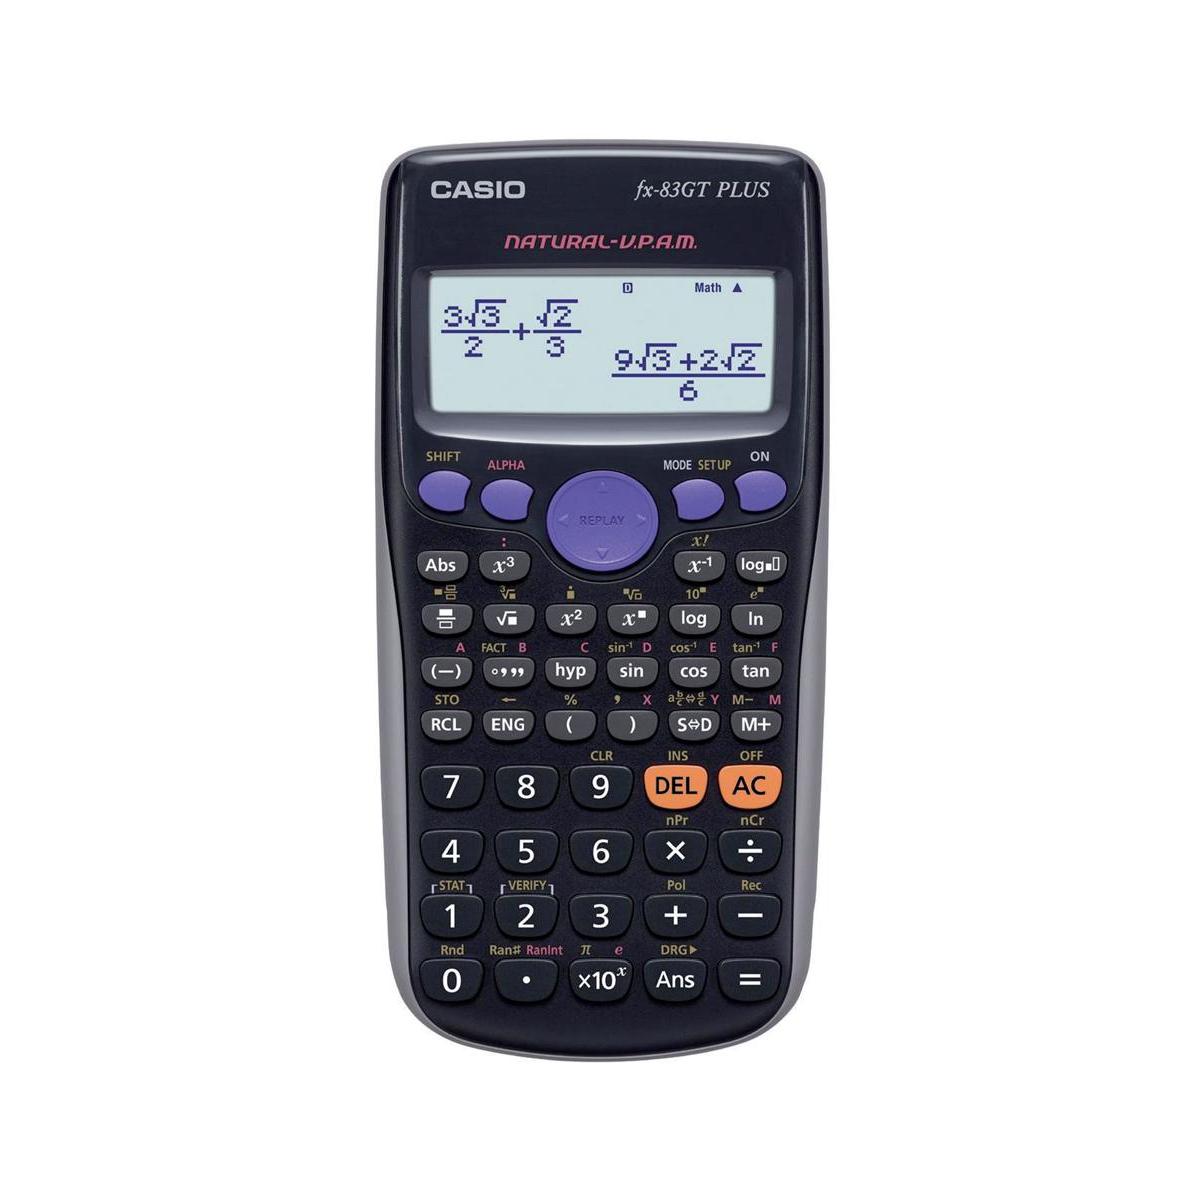 Casio Scientific Calculator Continuous Display 260 Functions 80x13.8x162mm Black Ref FX83GT